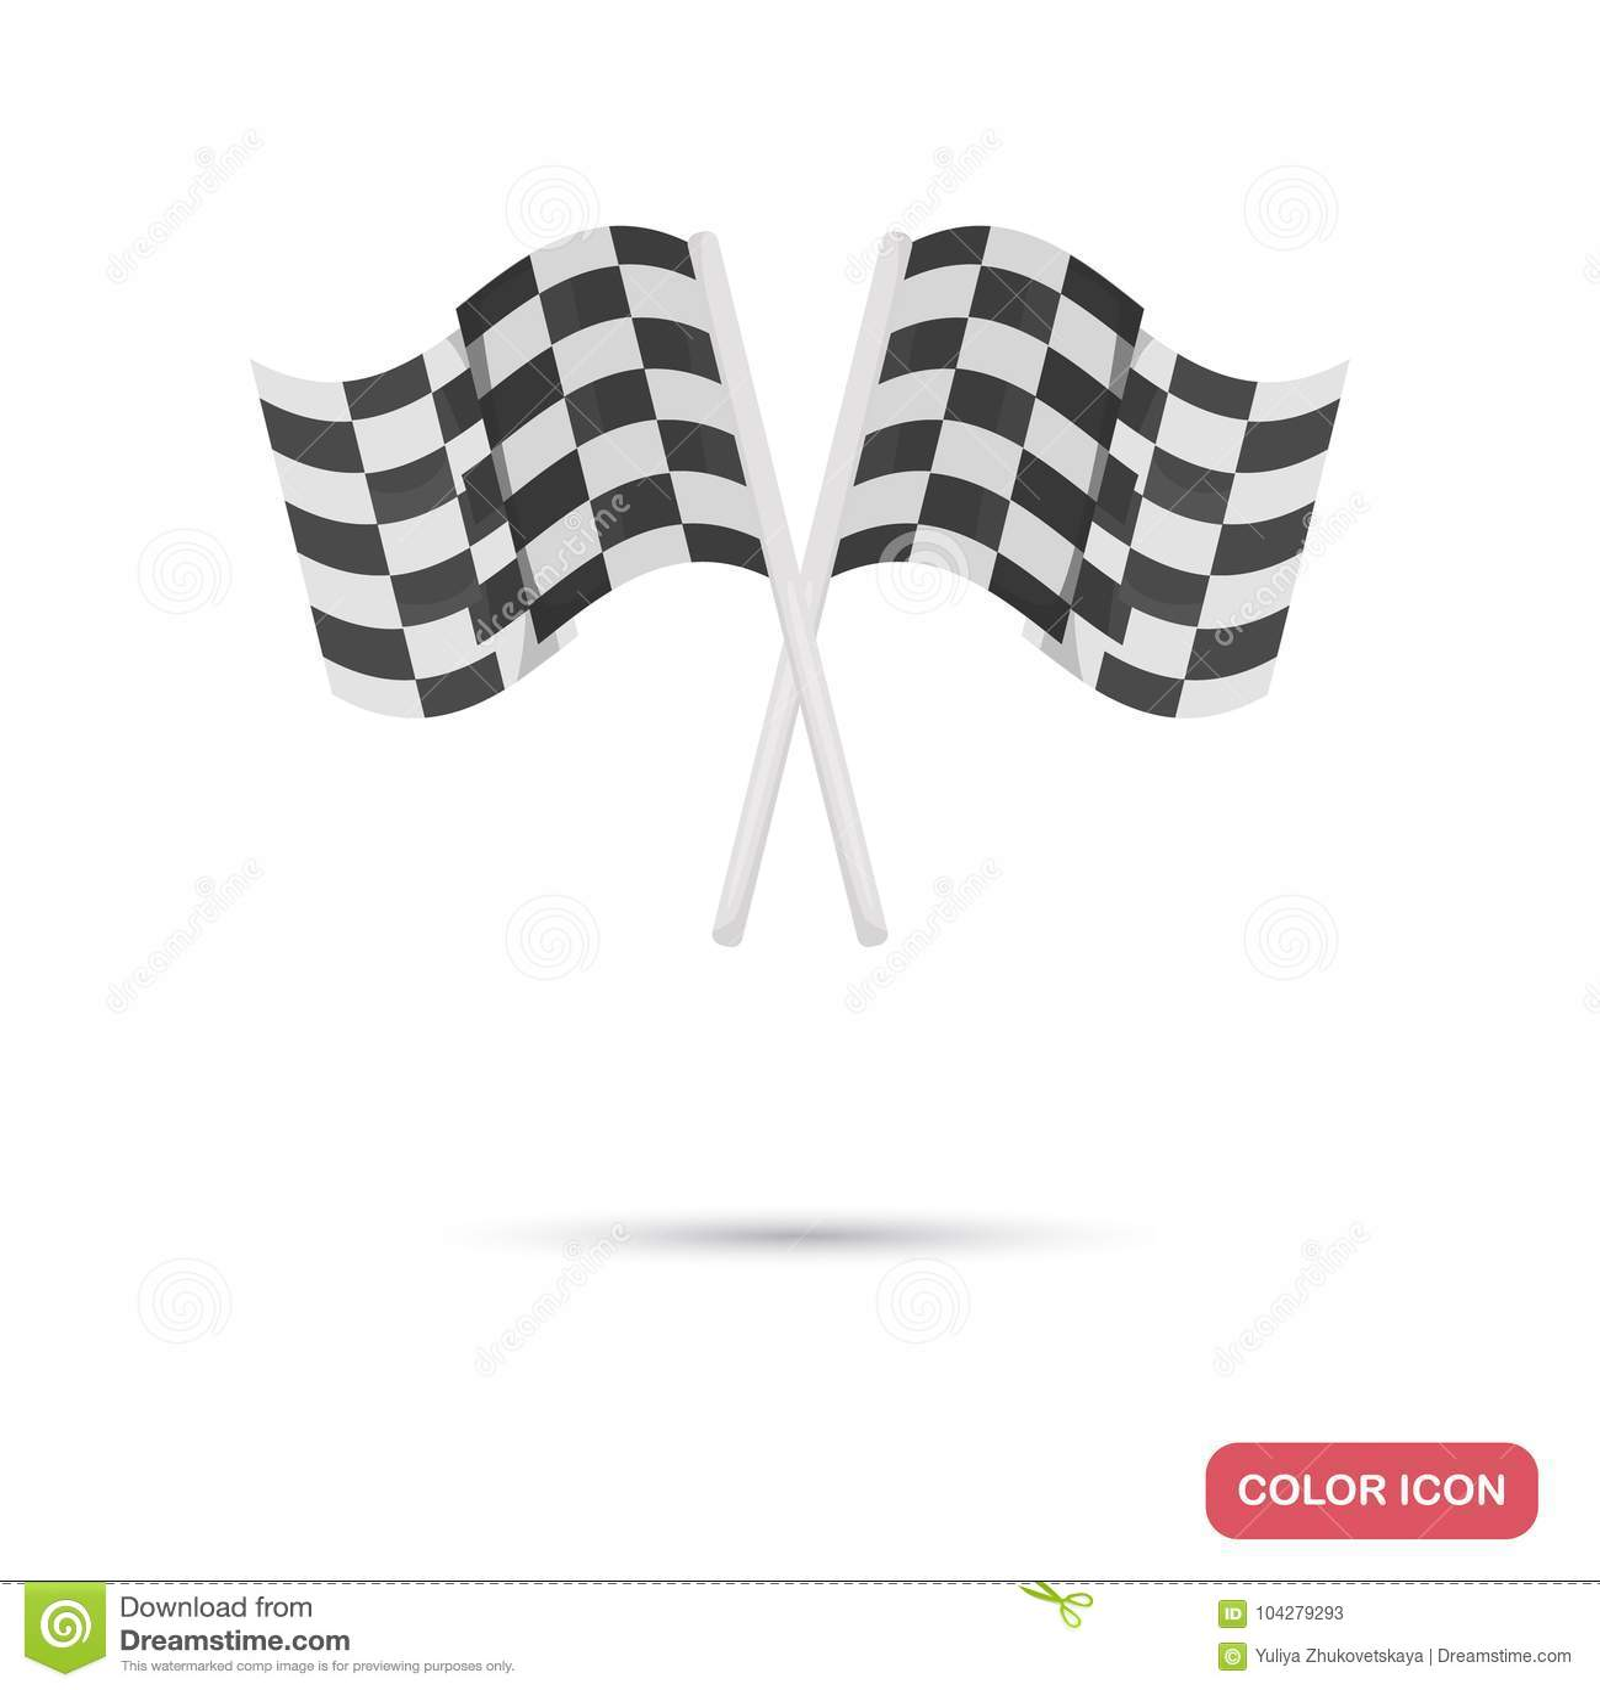 finish track flags color flat icon stock illustration illustration